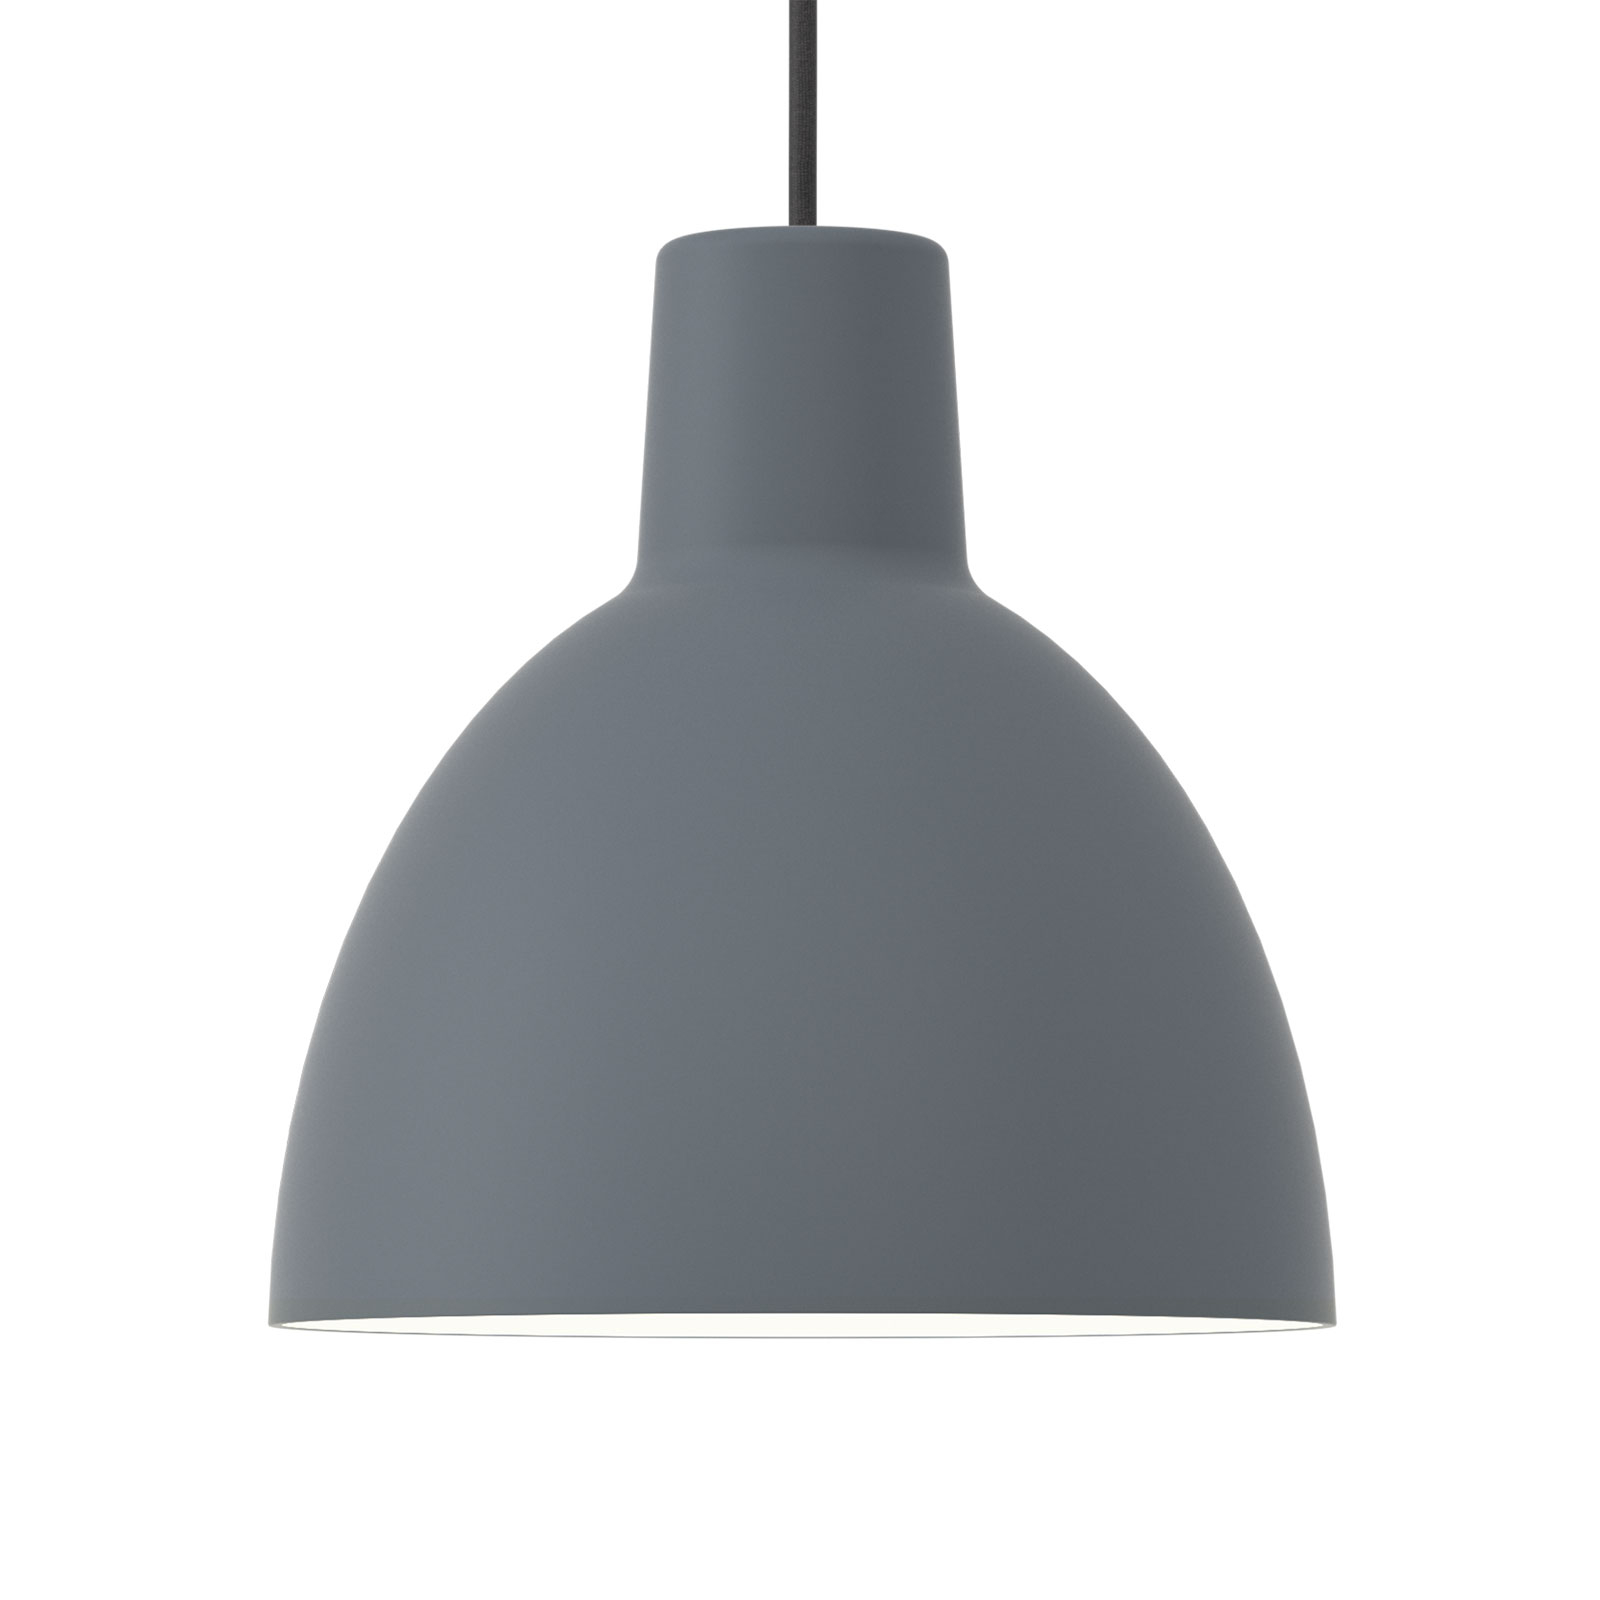 Louis Poulsen lámpara Toldbod 250, azul gris